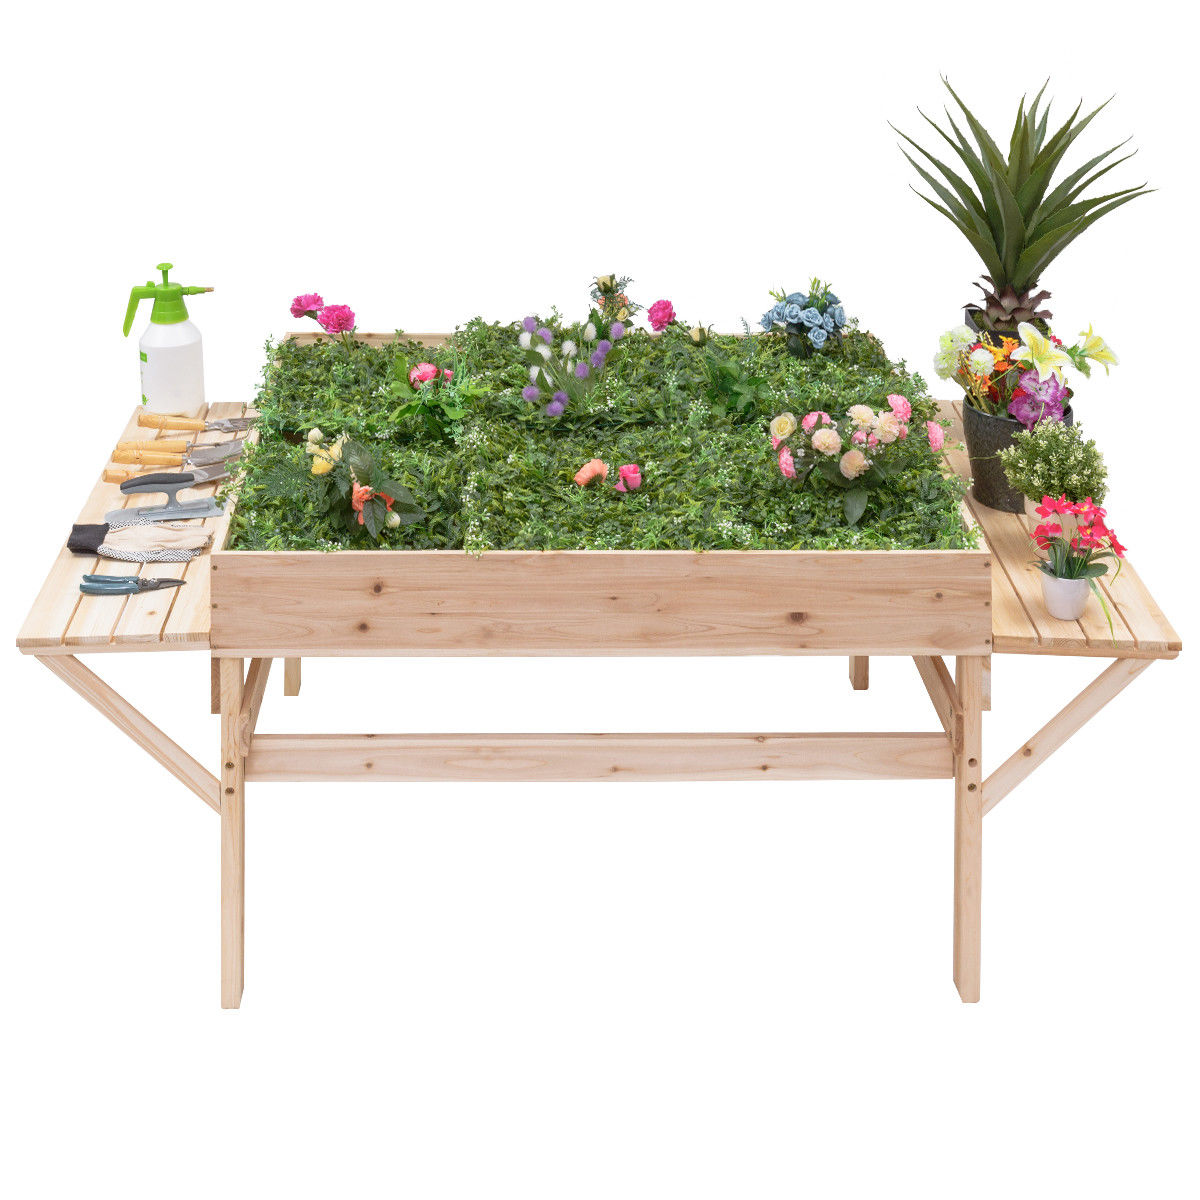 Garden Wood Raised Durable Planter Bed